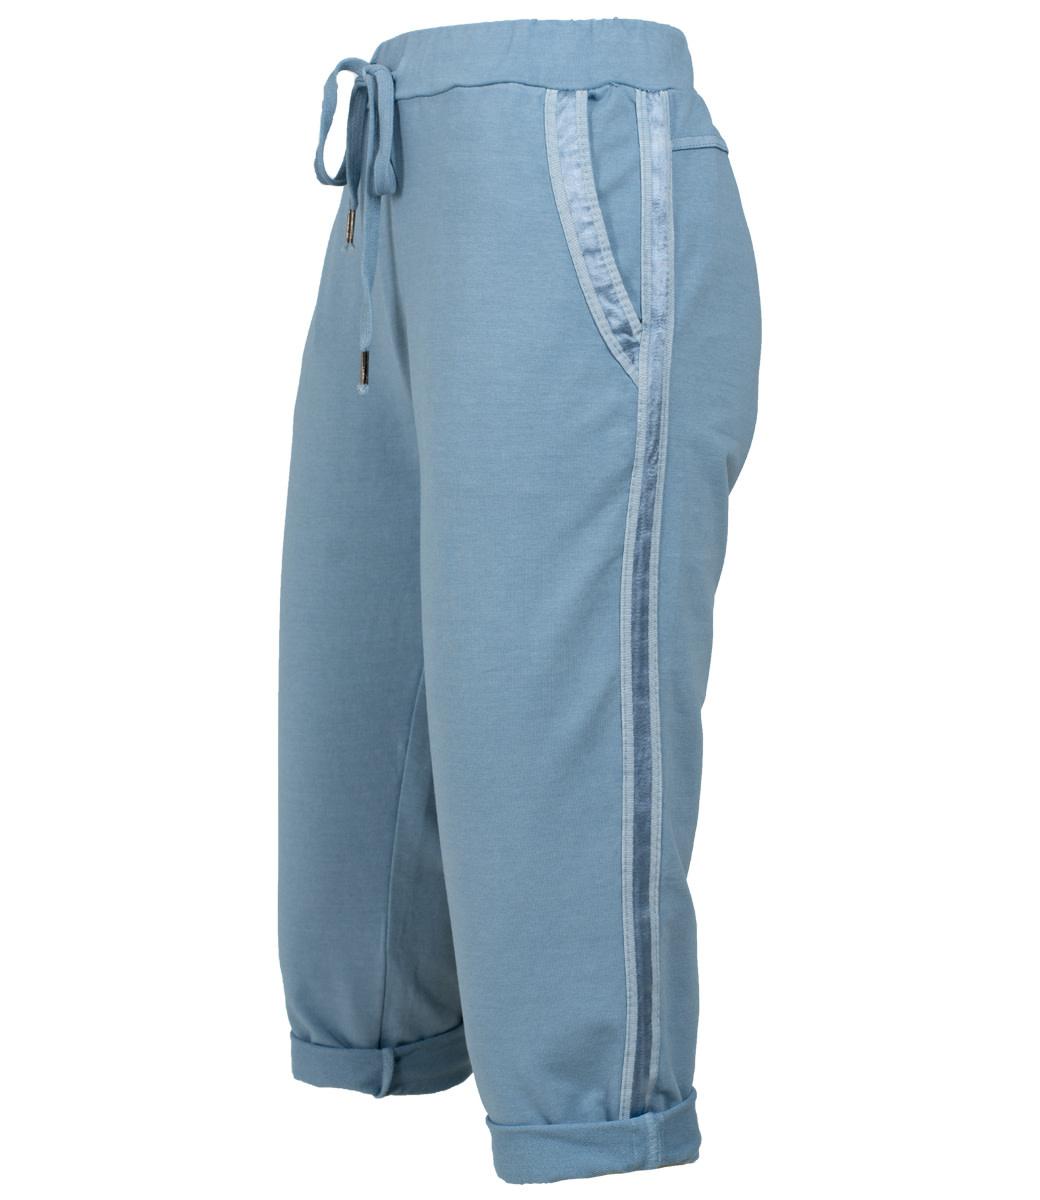 Gemma Ricceri Capri jeansblauw Nienke